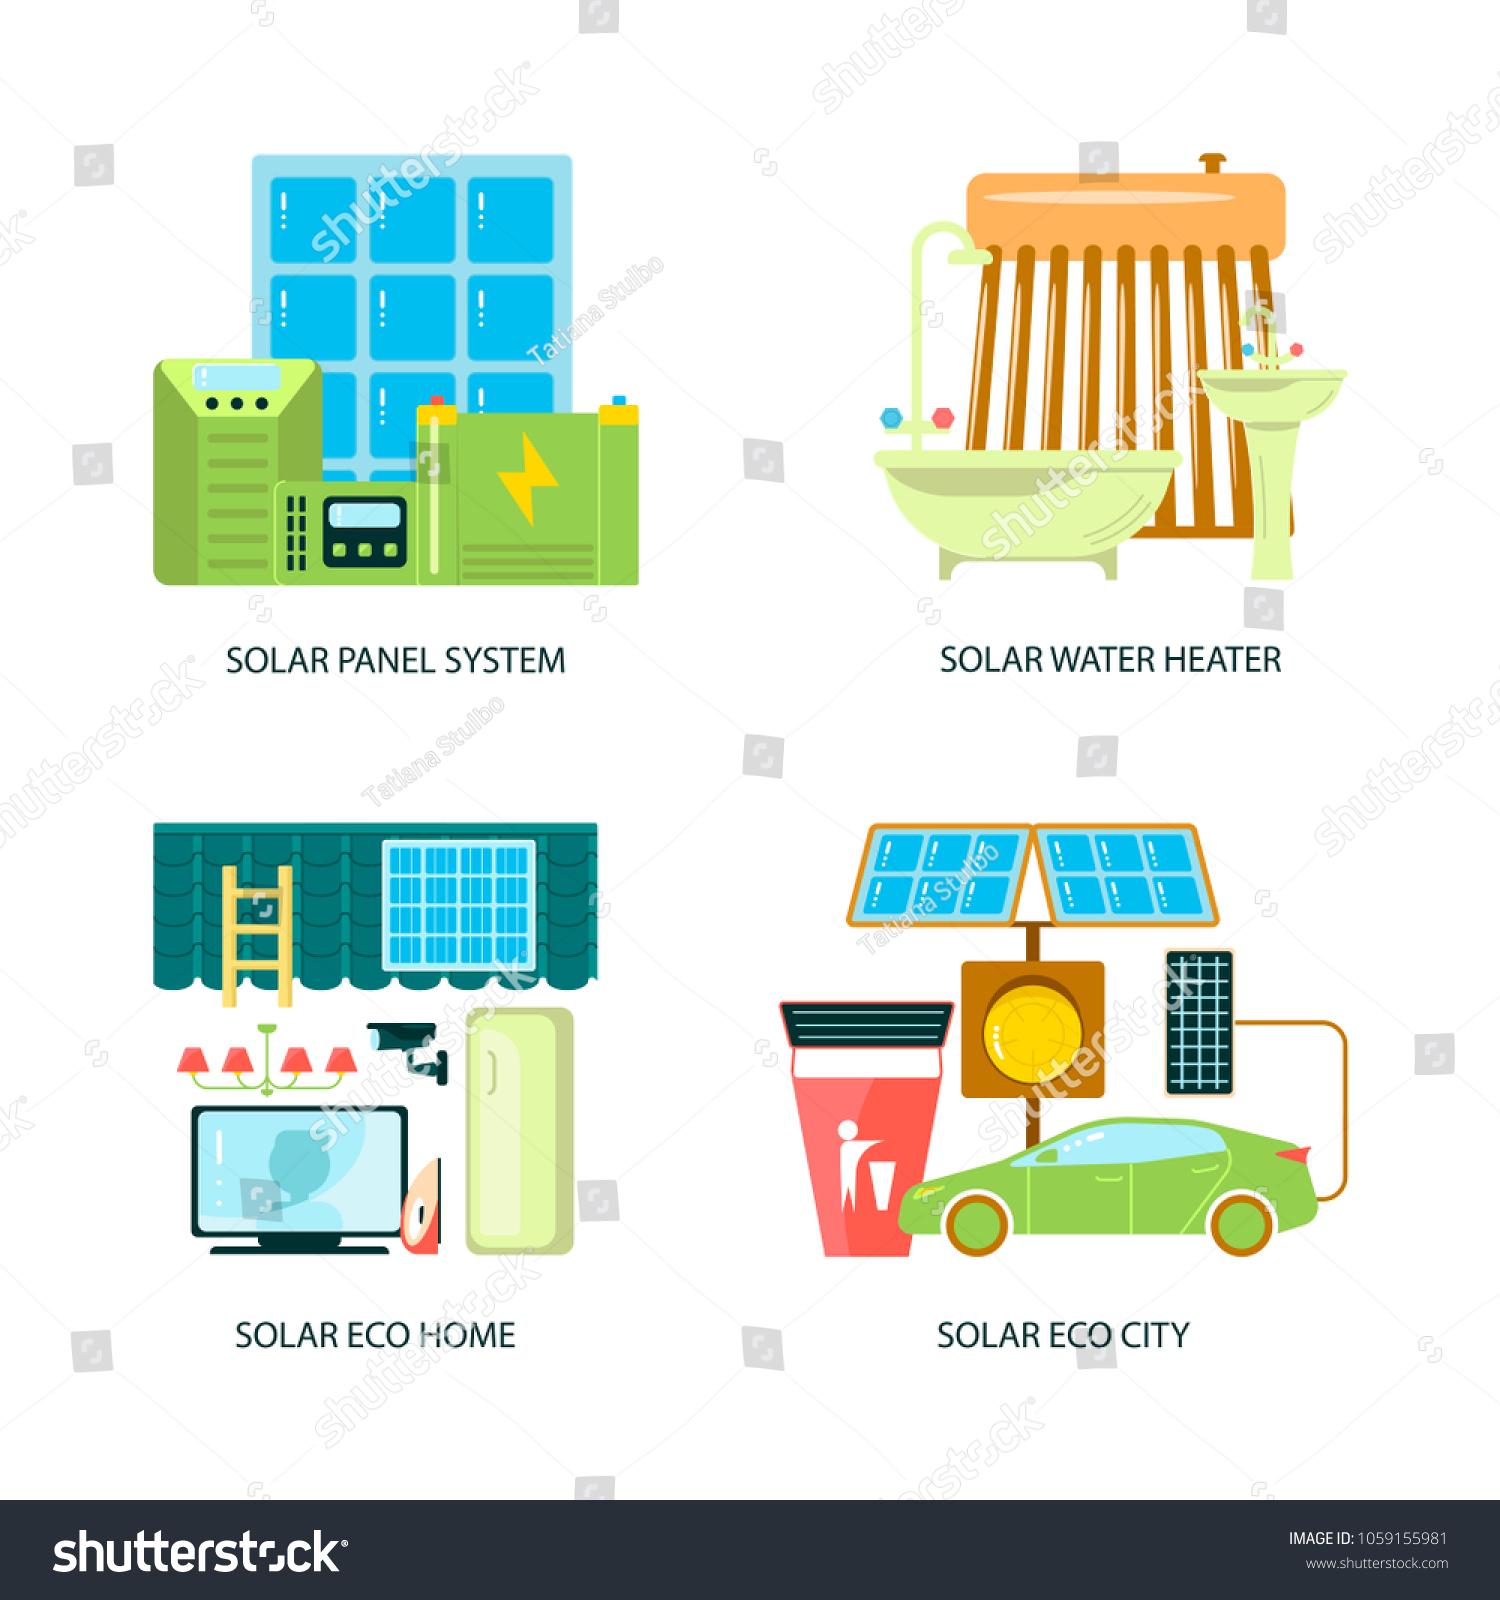 Modern Eco Technologies City Solar Energy Stock Photo (Photo, Vector ...